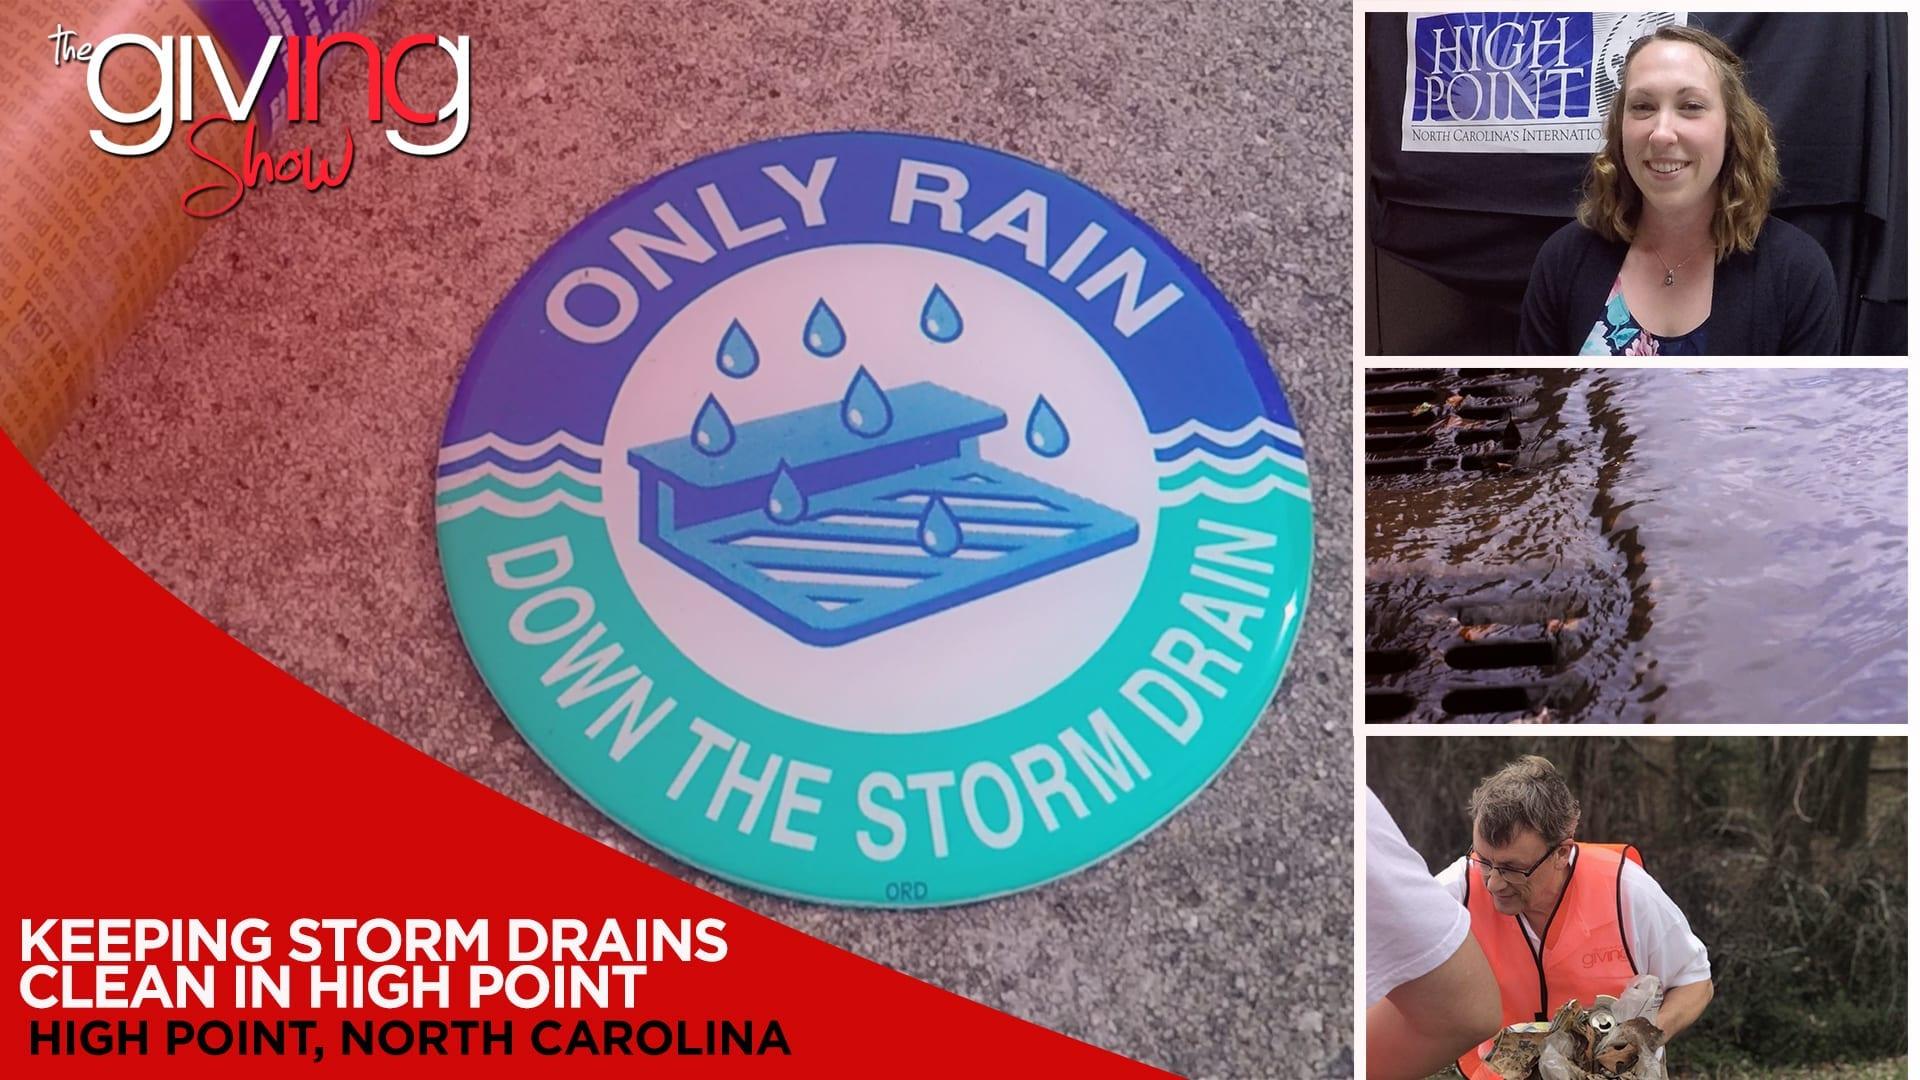 Keeping Storm Drains Clean